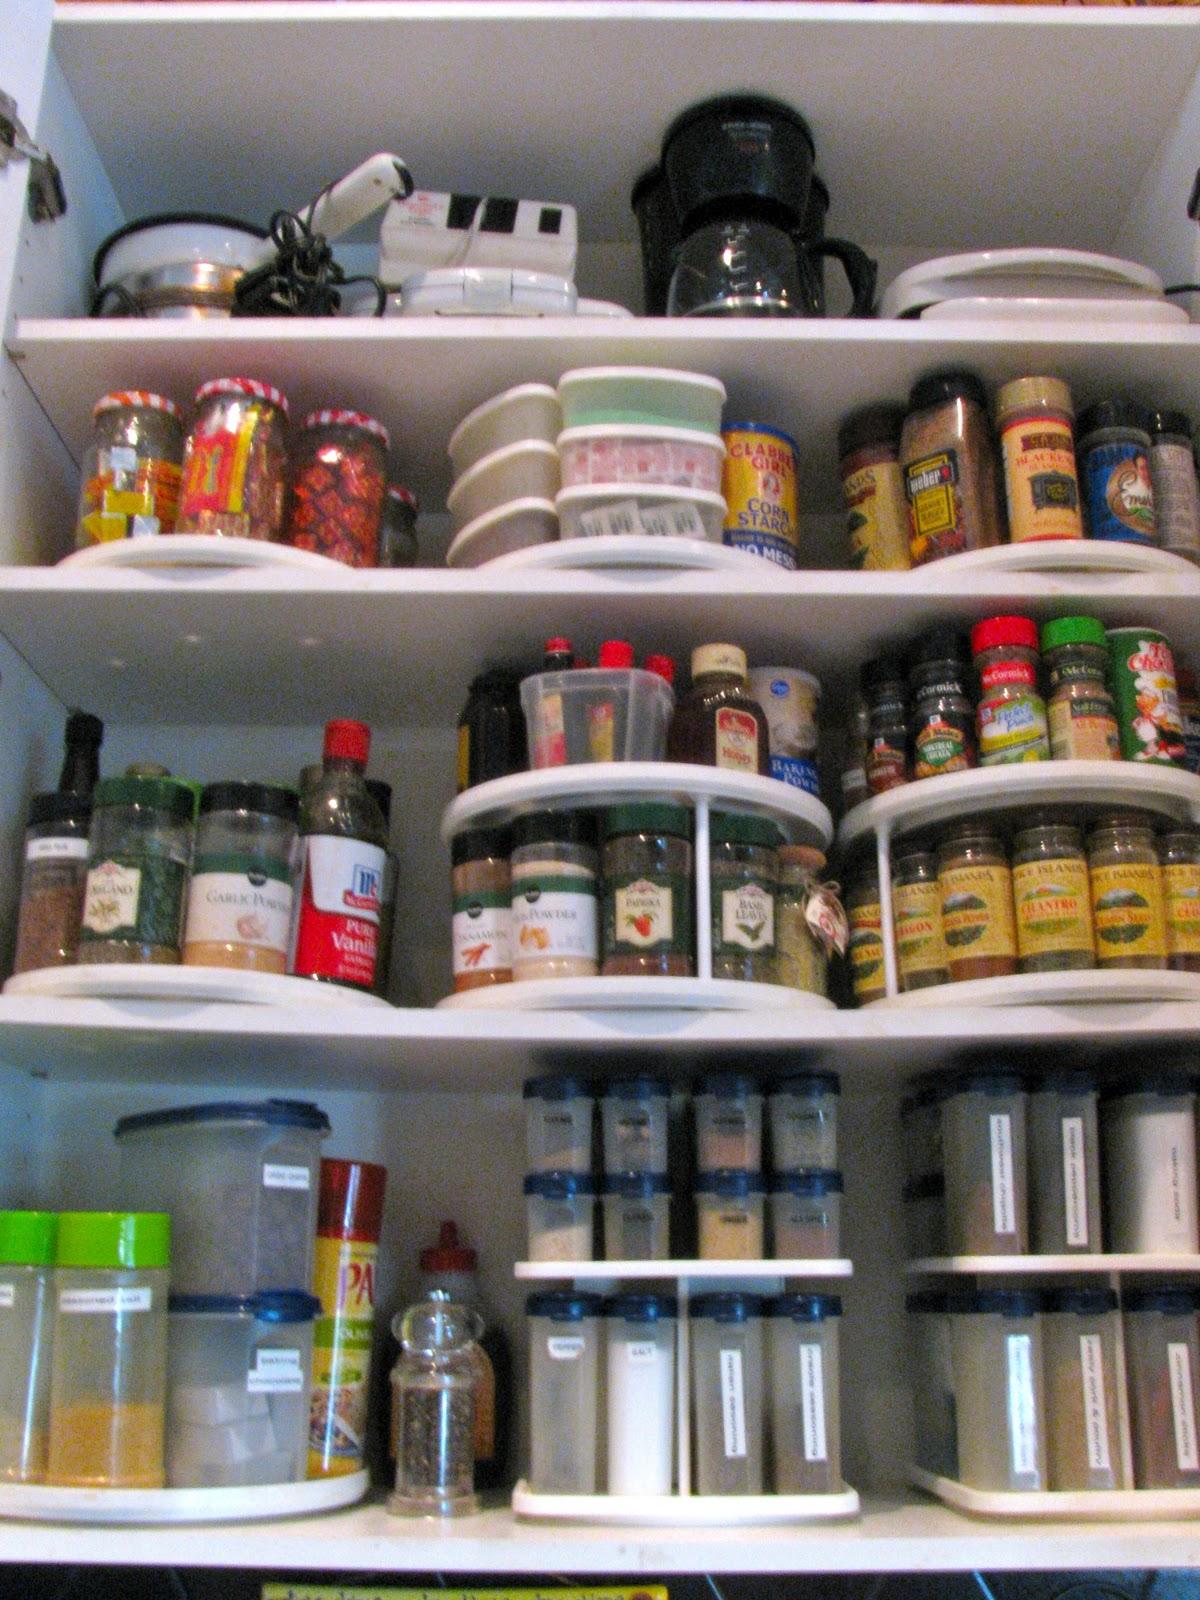 Shelf Kitchen Cabinet May Days Organizing The Pantry